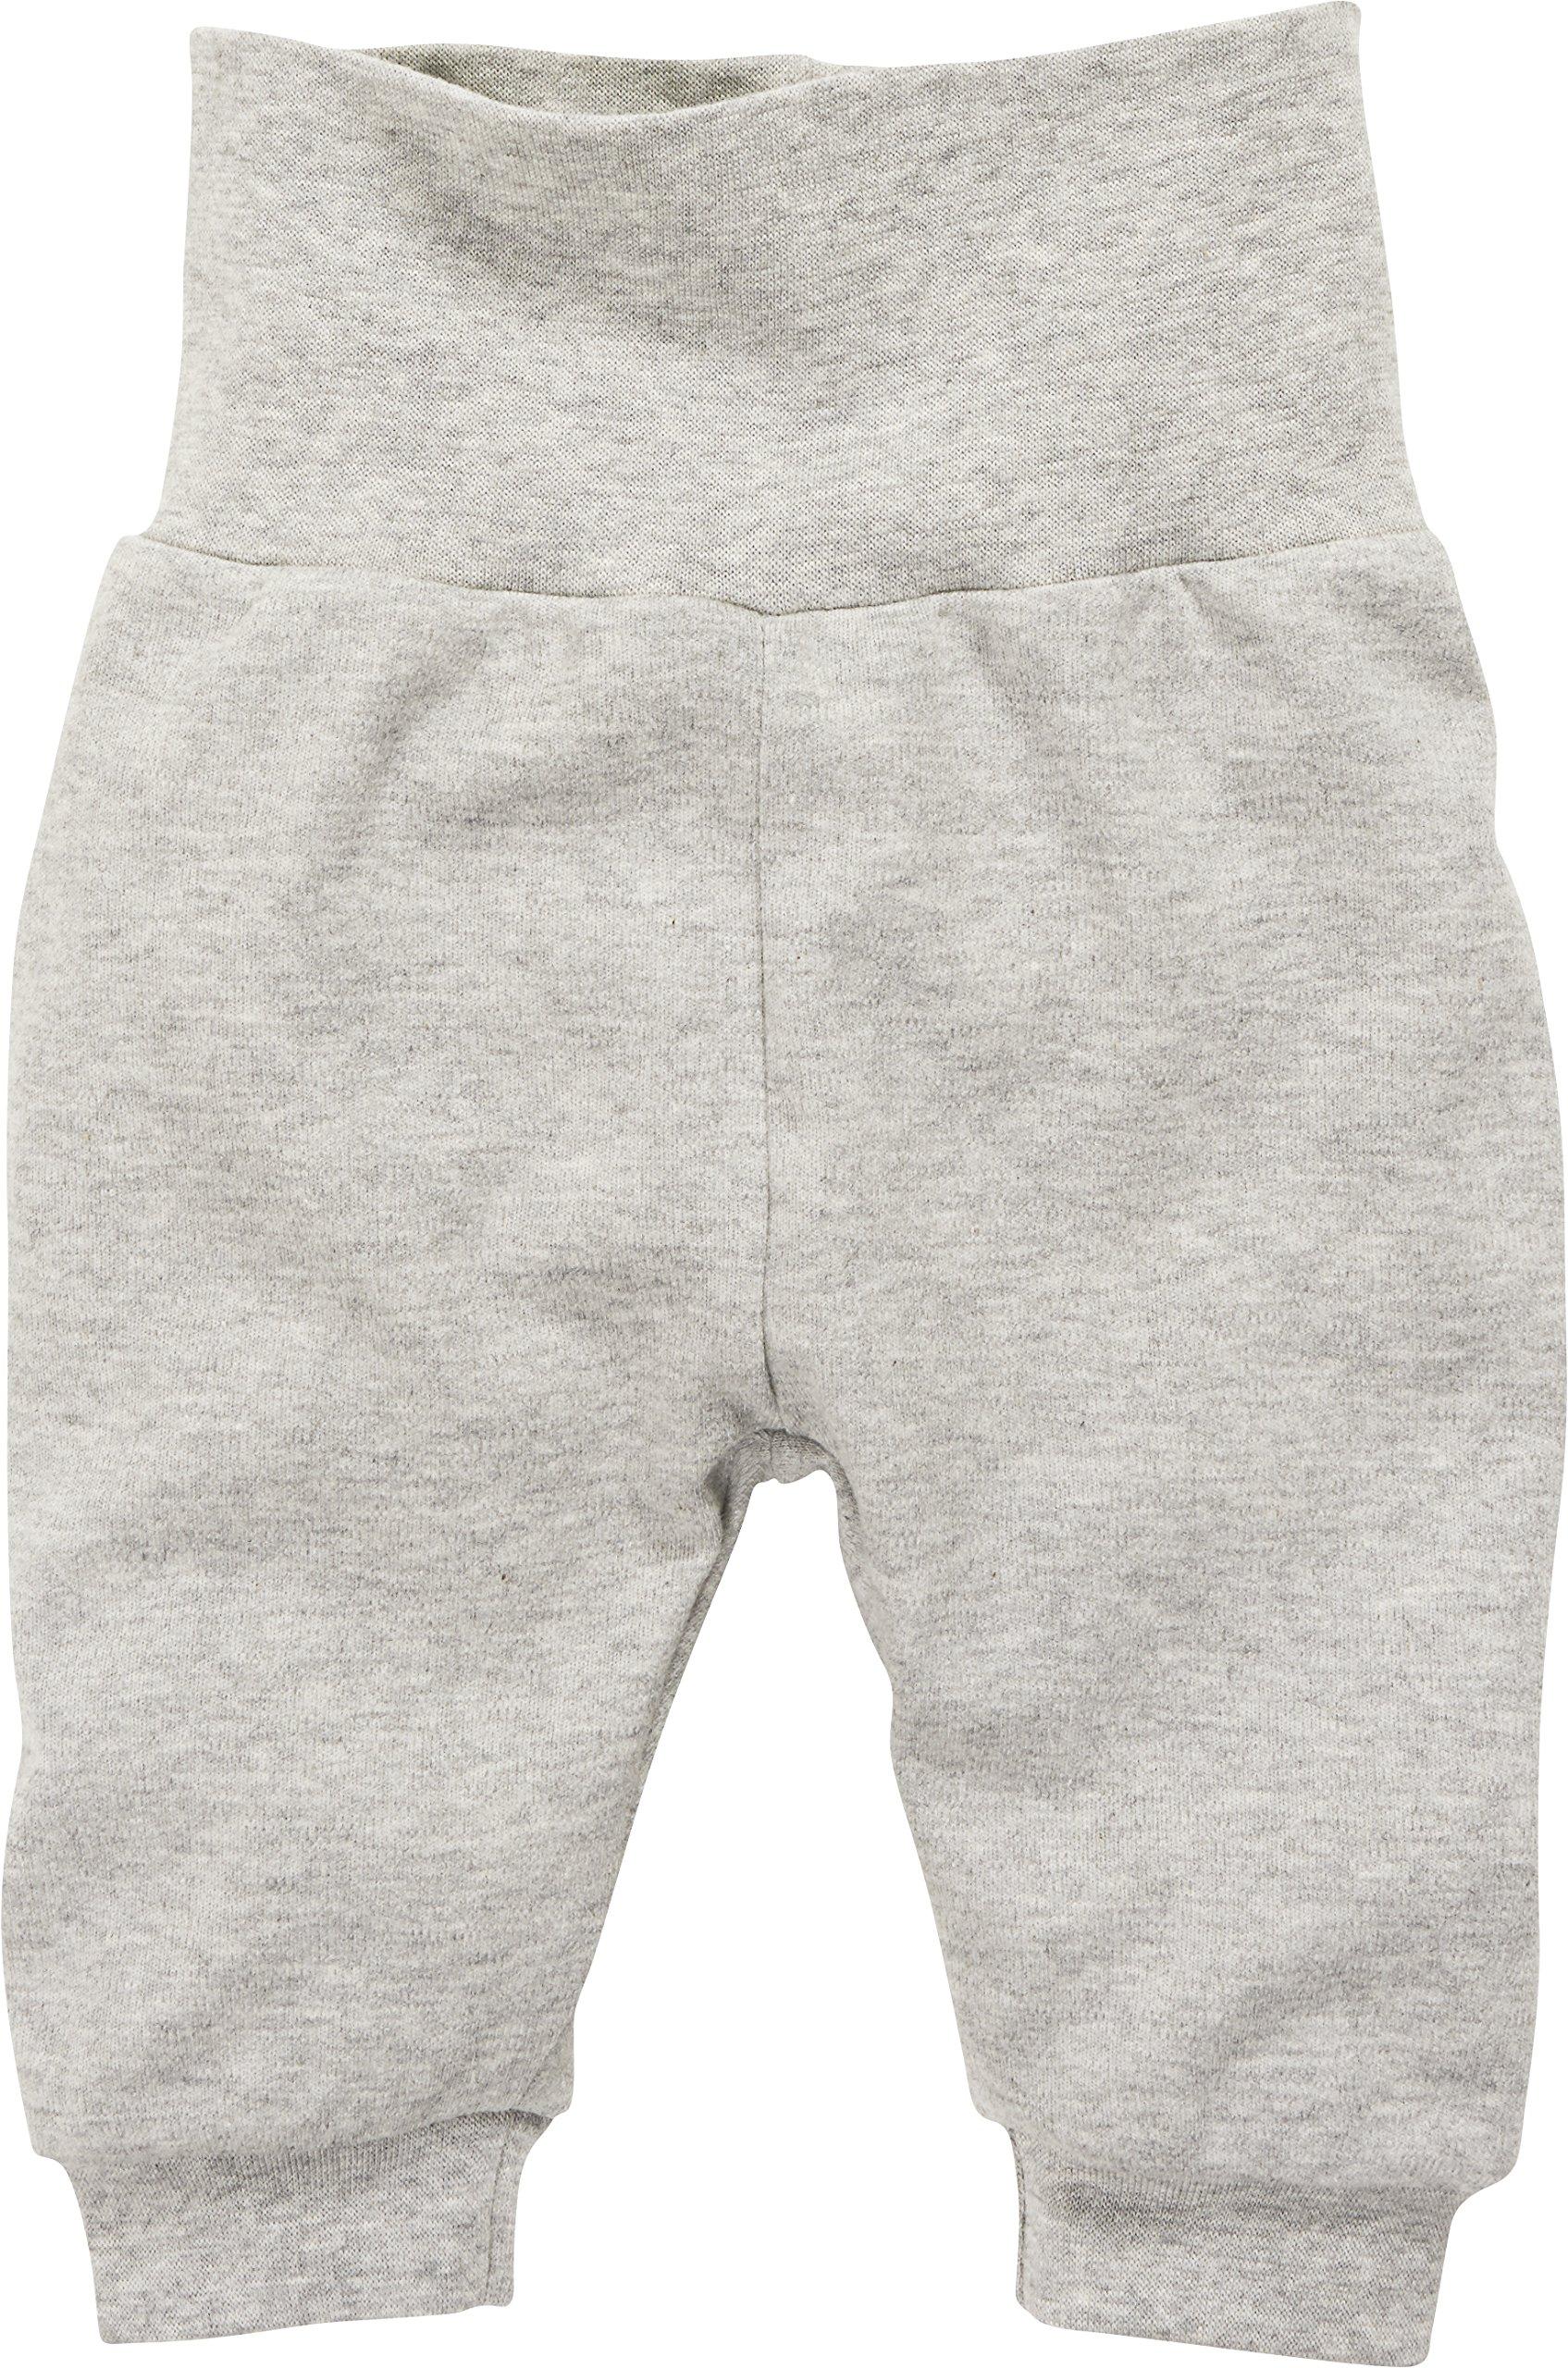 Schnizler Baby-Pumphose Interlock Pantalones para Bebés 2